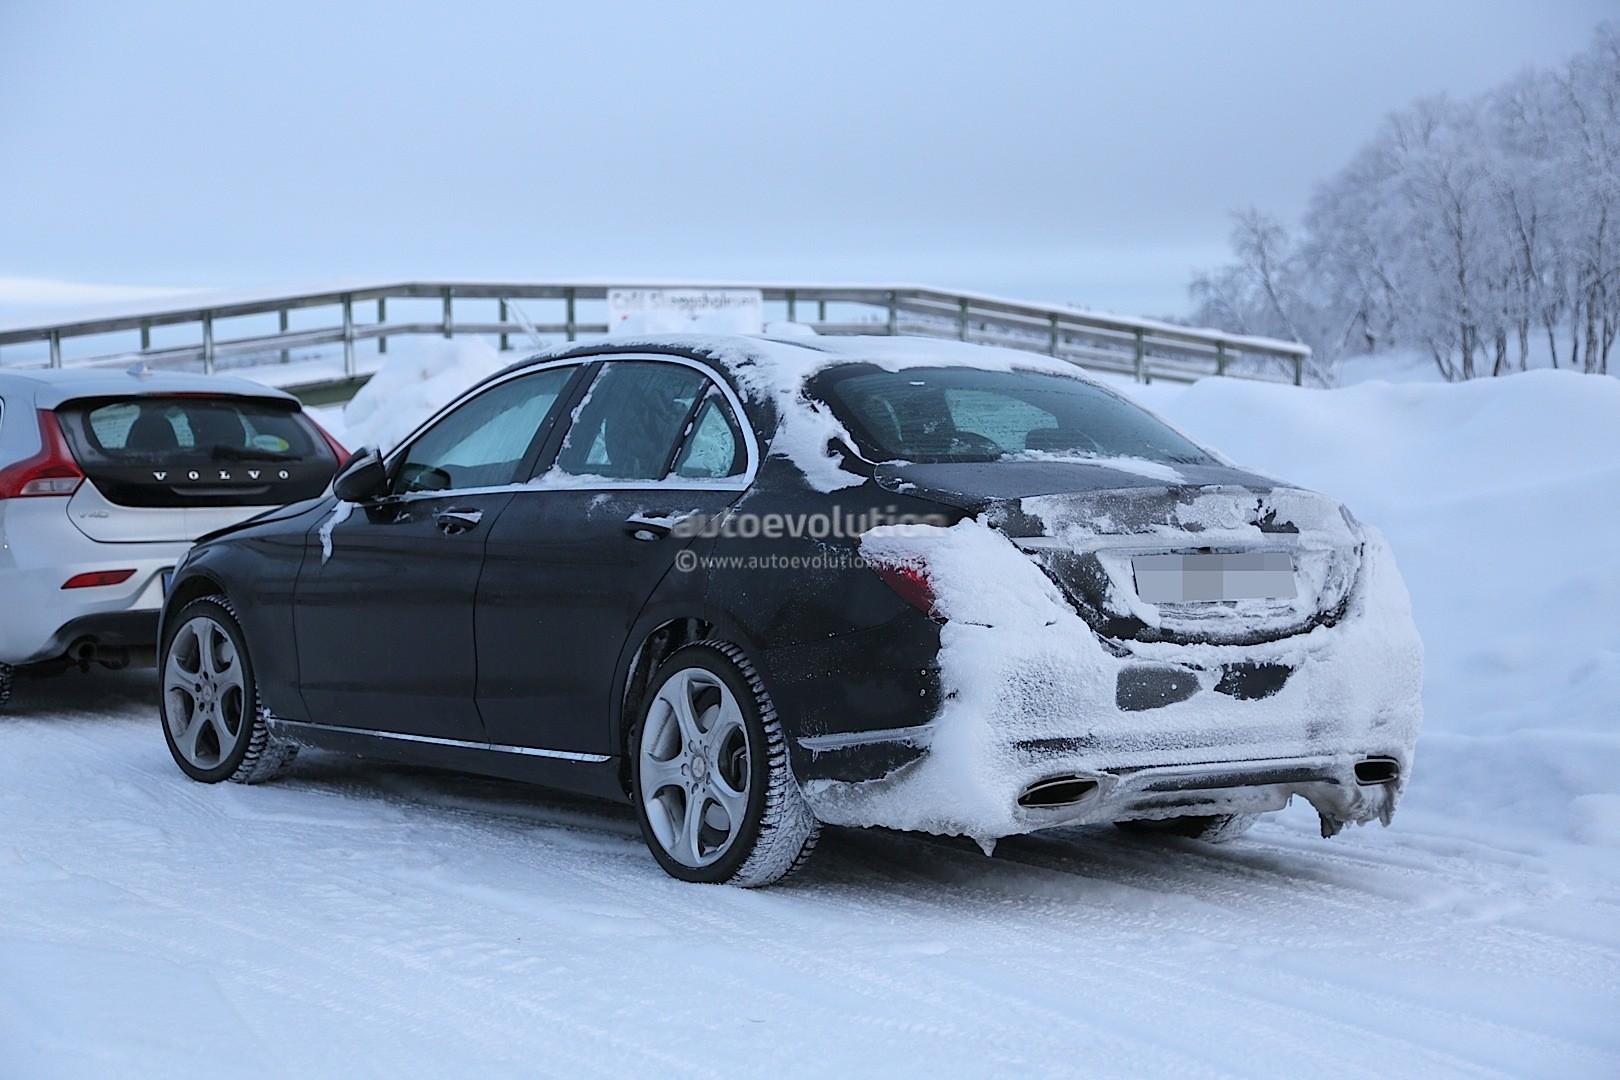 2018 Mercedes C-Class Facelift Interior Spyshots: S-Class ...